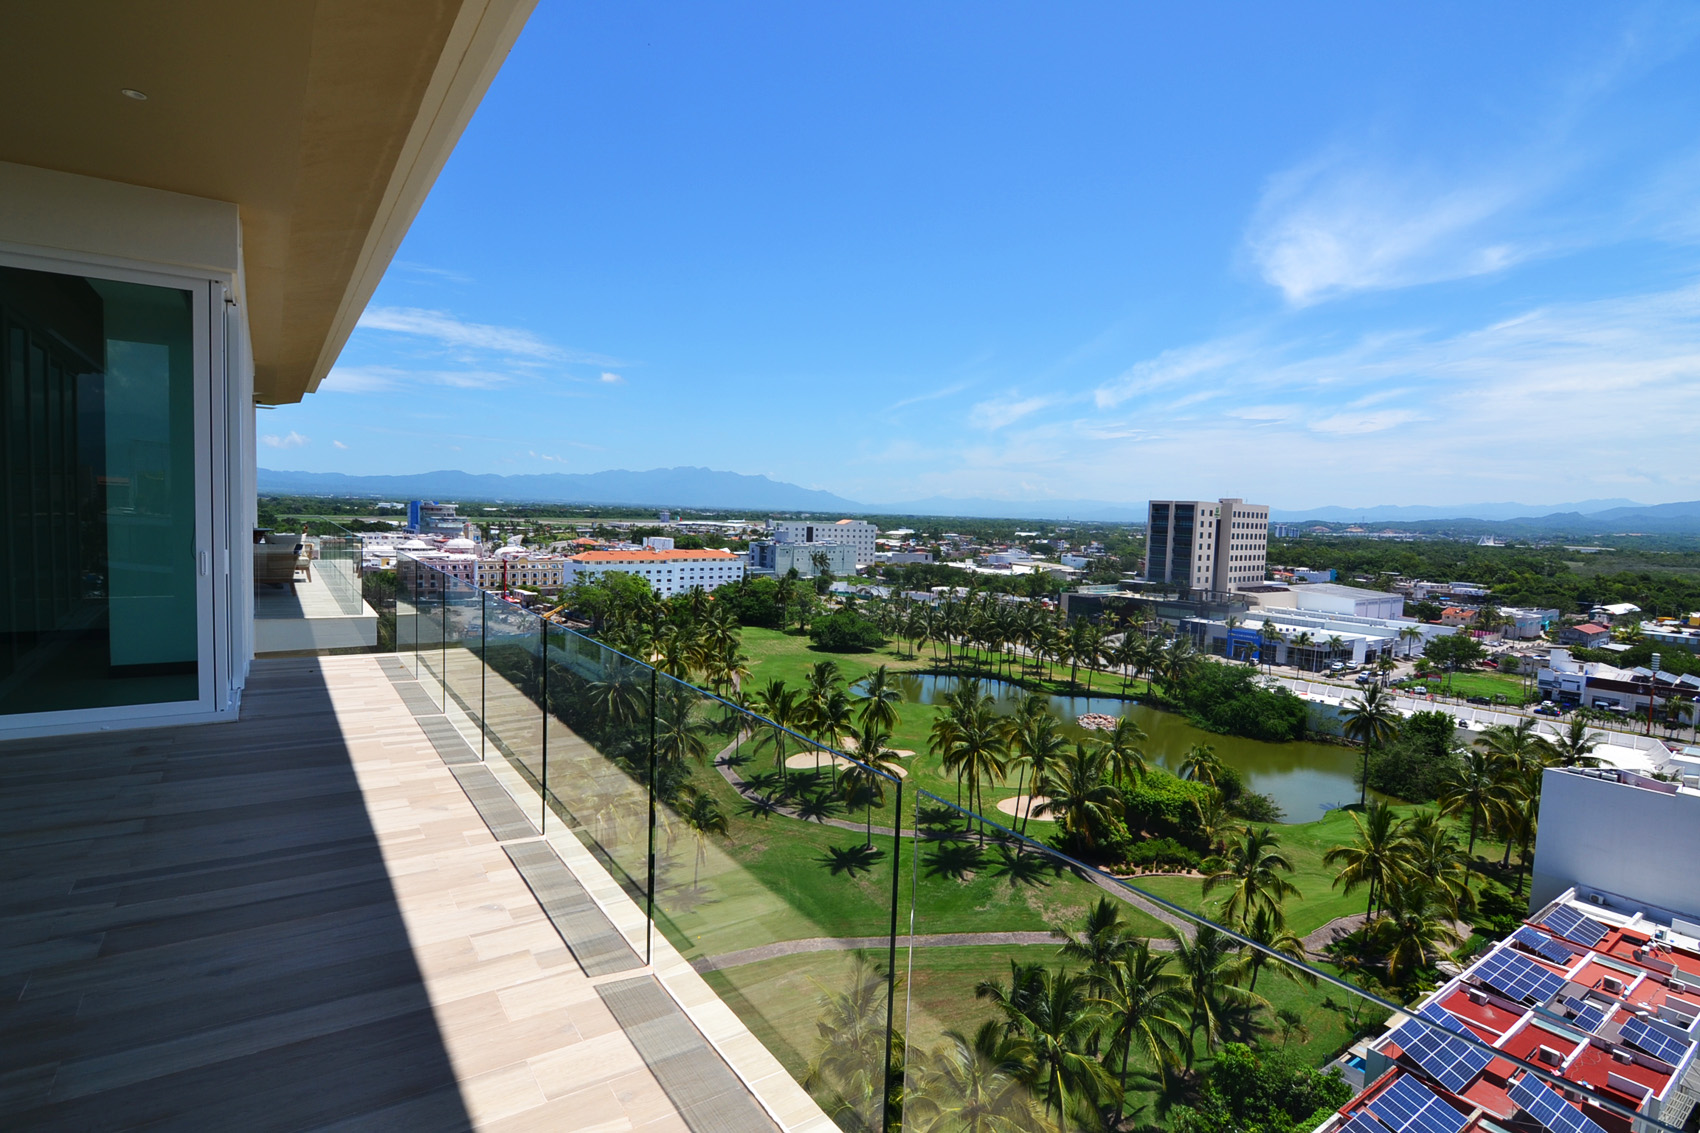 Condo VMarina PH10 - Puerto Vallarta Luxury Condo For Rent (62)